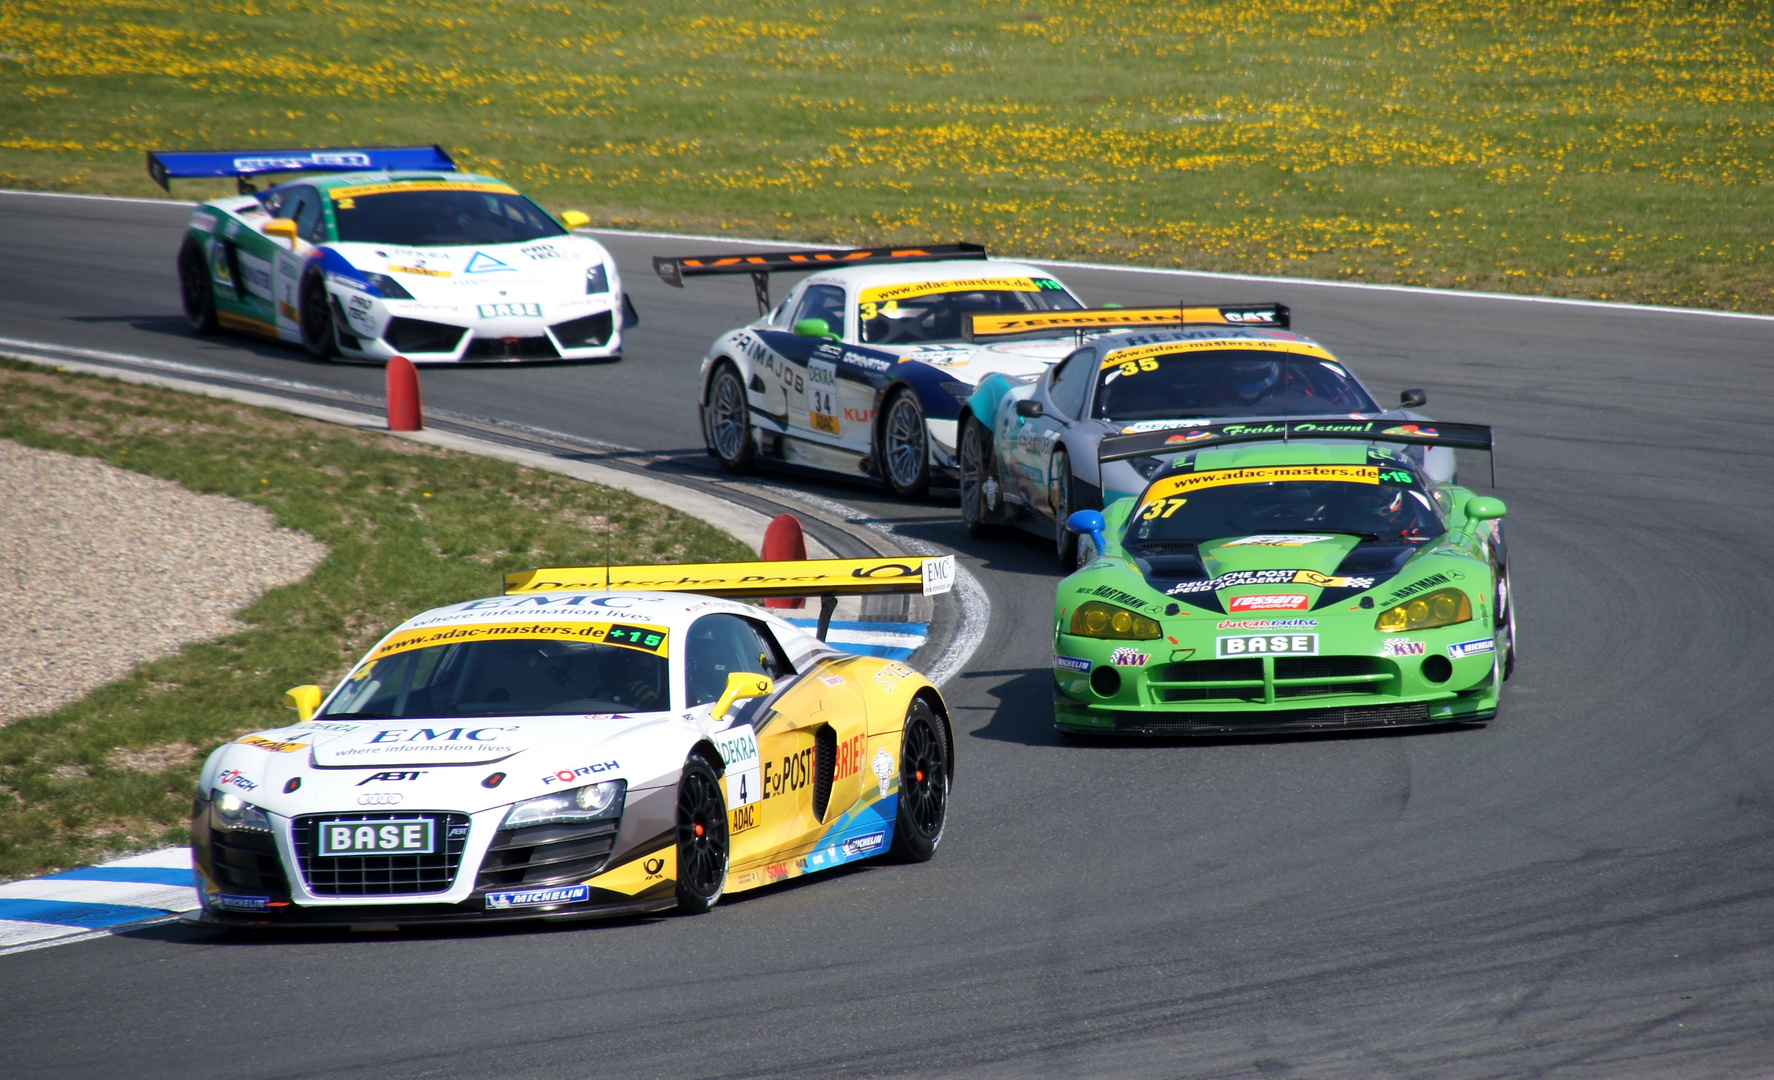 ADAC GT Masters Oschersleben 2011